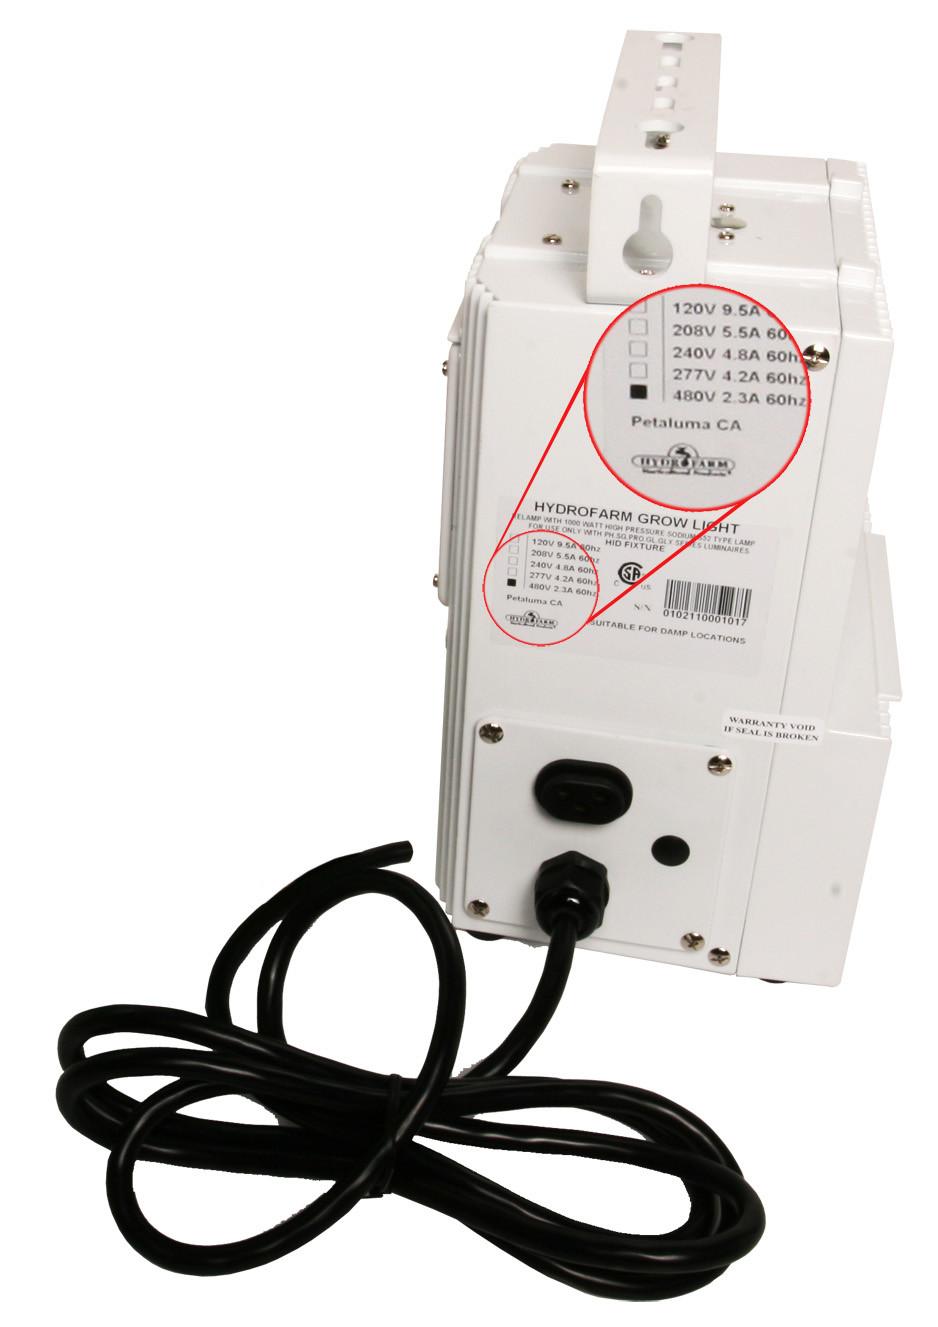 Hydrofarm PowerHouse 1000 Watt Magnetic HPS Ballast, 480 Volt